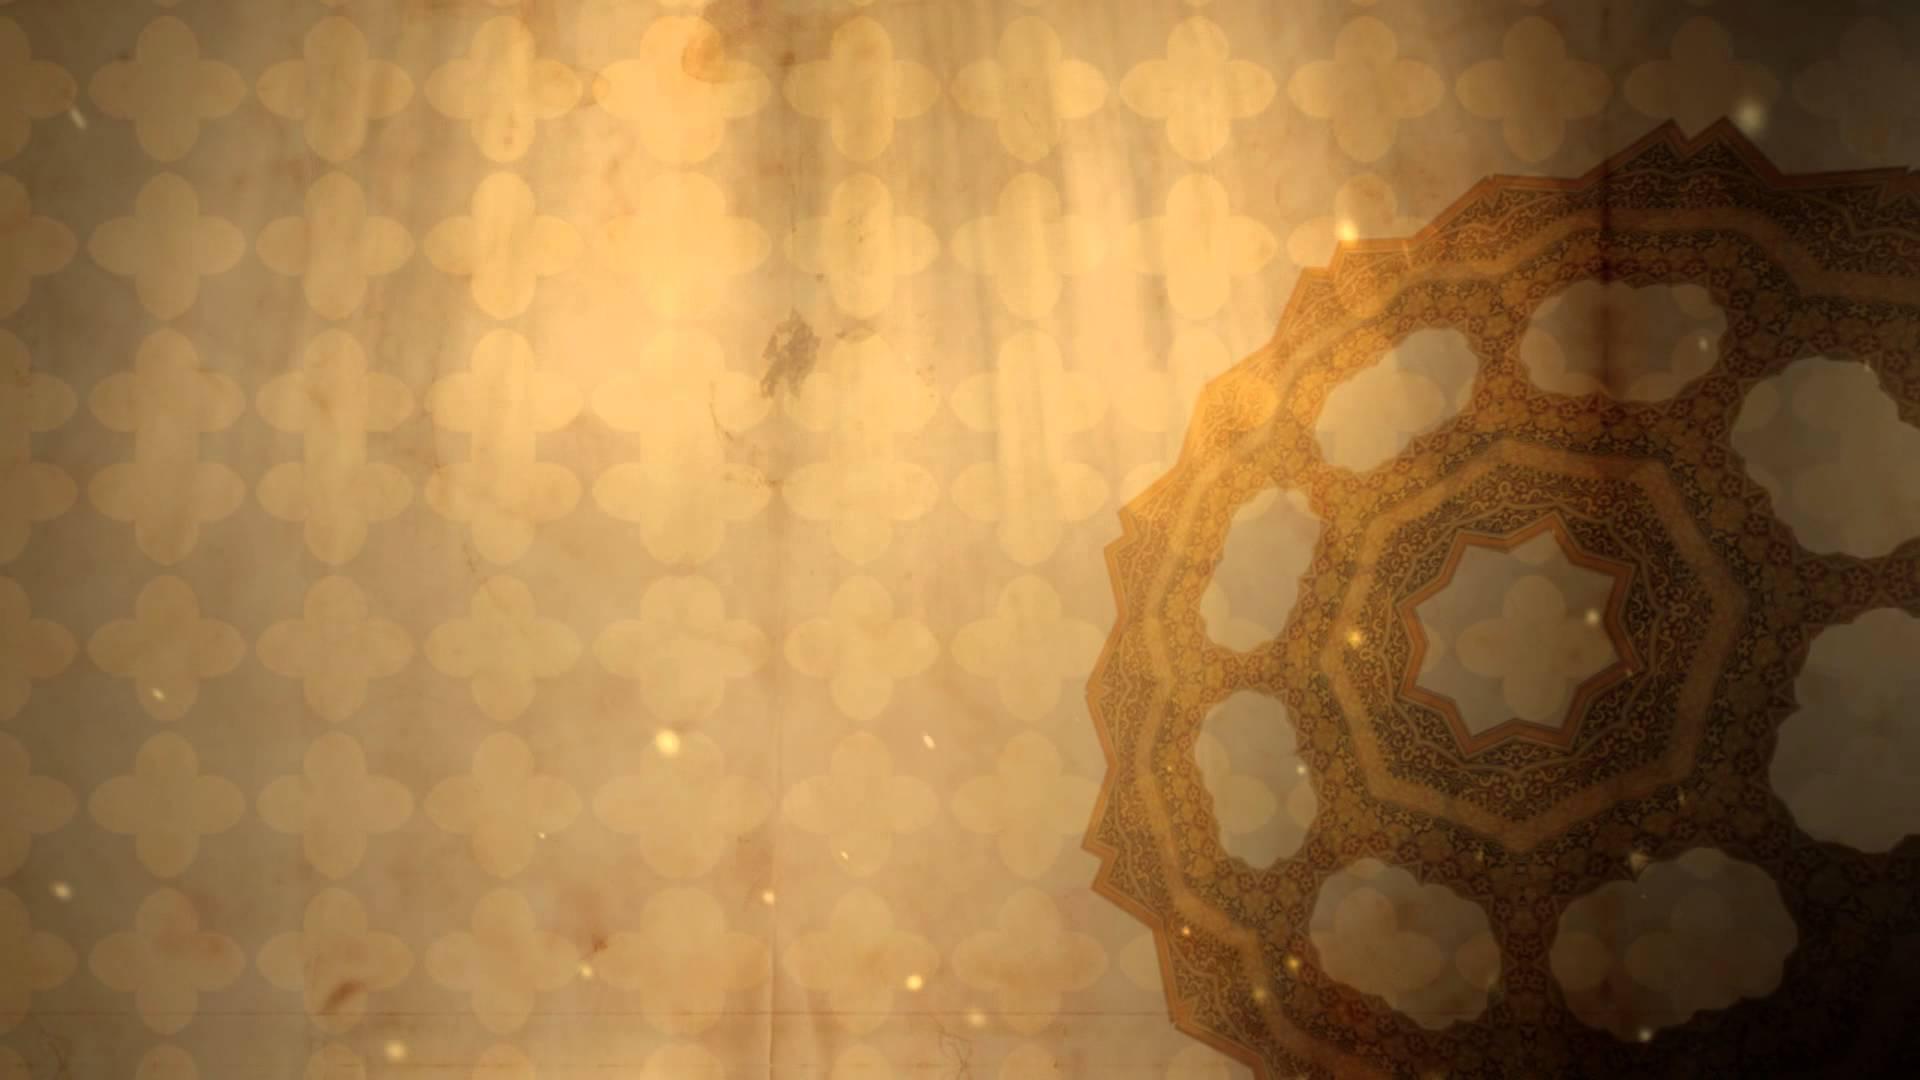 fractal 3d islamic background